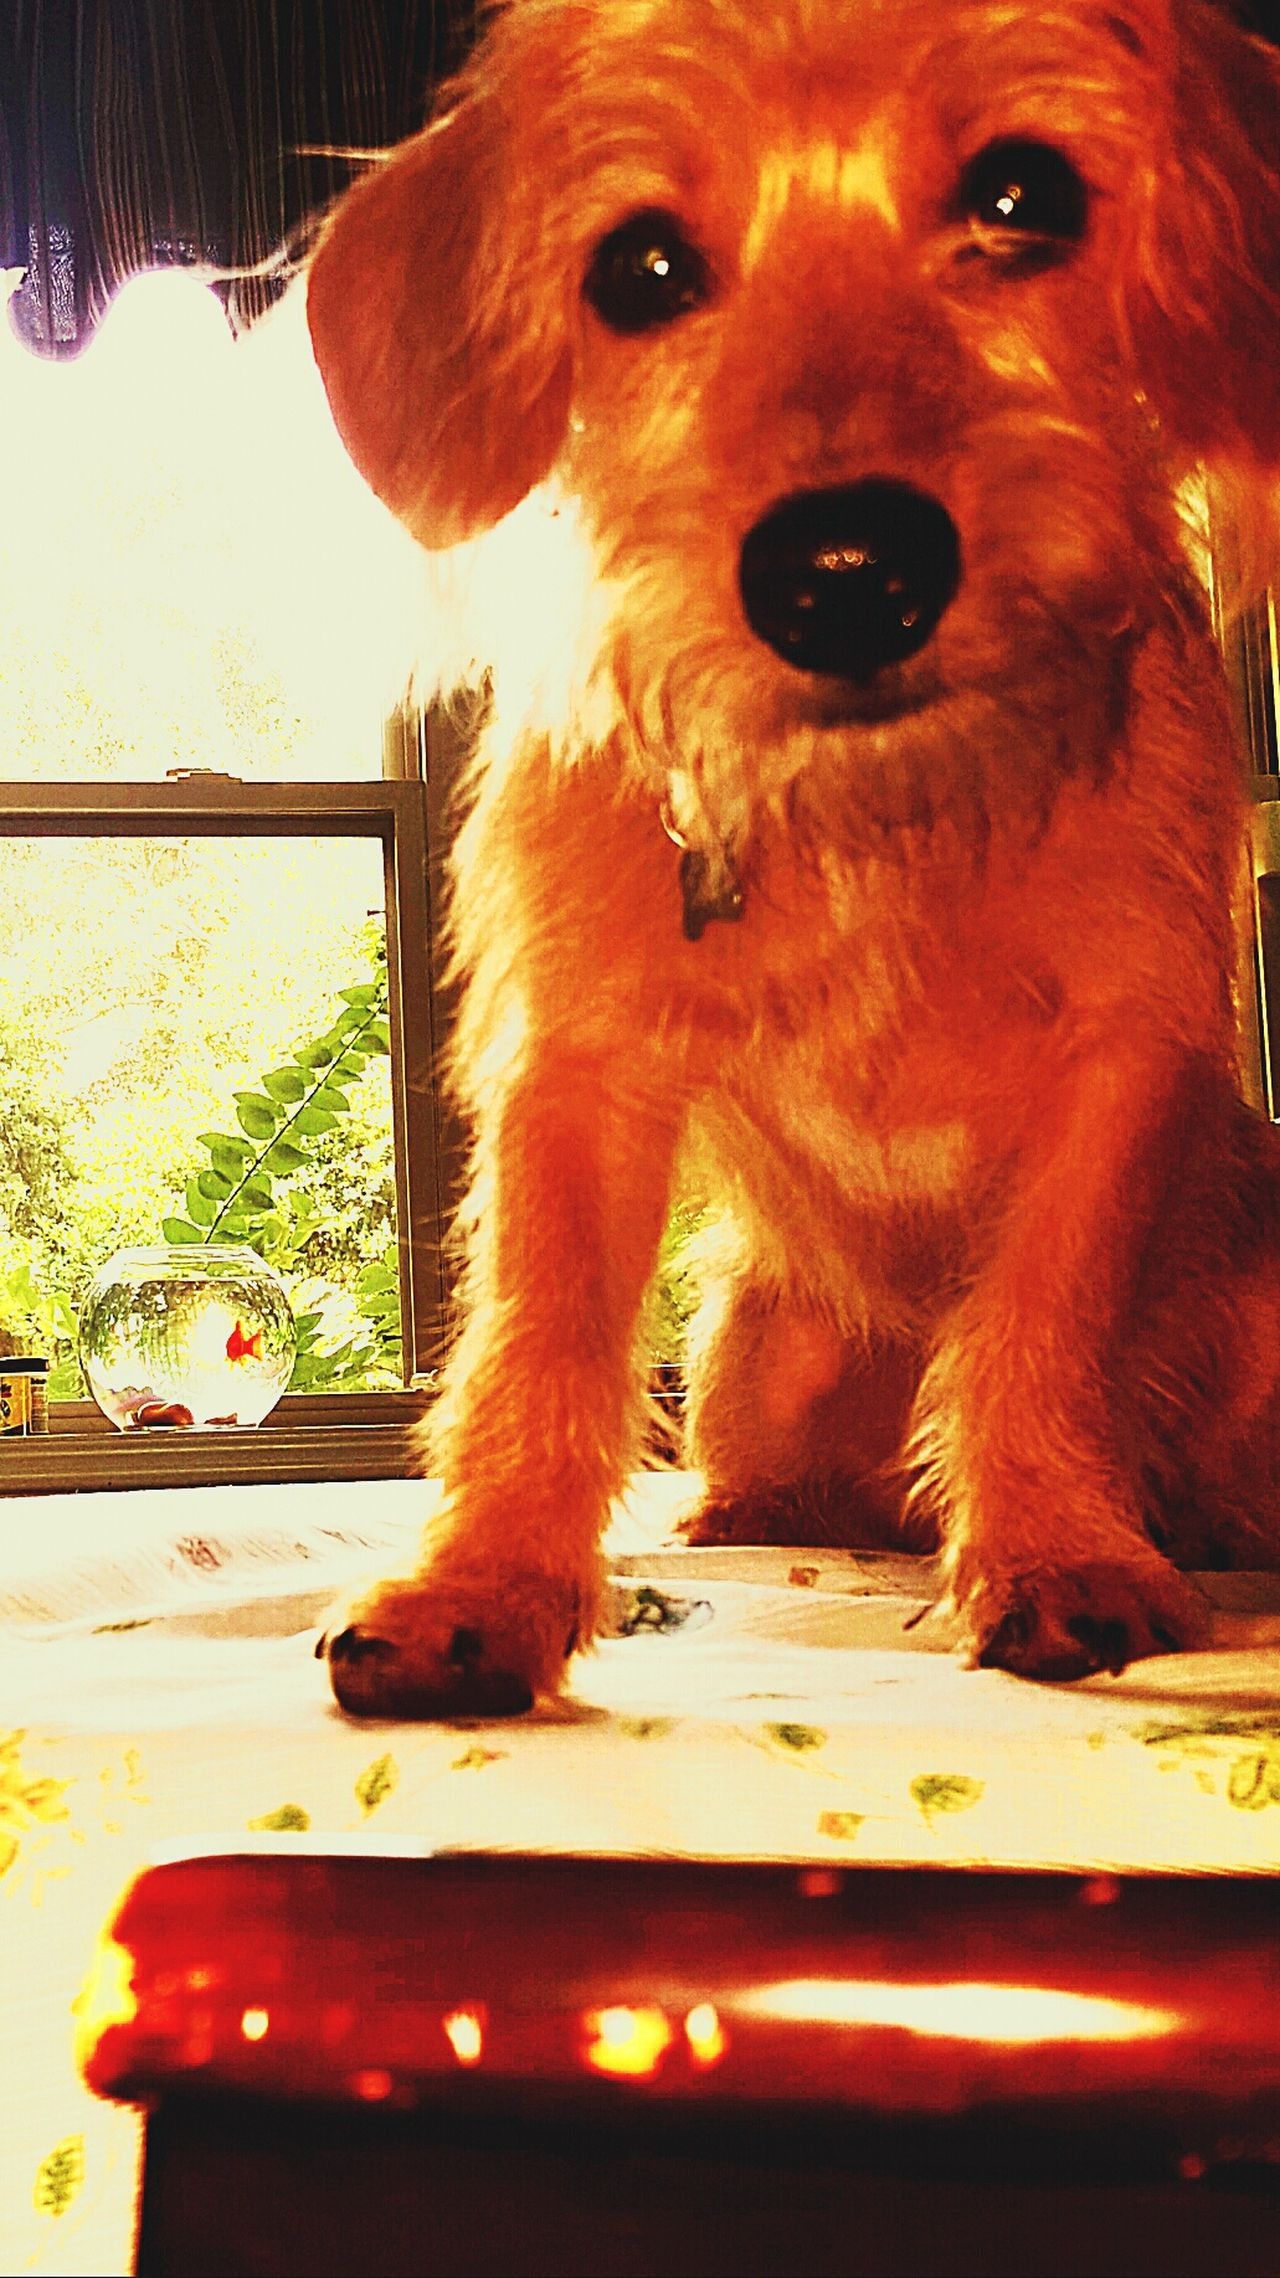 Dog Photos Official EyeEm © Doggie On Kitchen Table With Goldfish Dog❤ Rescuedog Rescuedogtosuperdog Check This Out Dog Photography Dog Portrait Dogs Of EyeEm Doggy Love Dog Life Dogslife Small Dog Big Heart Pet Portraits